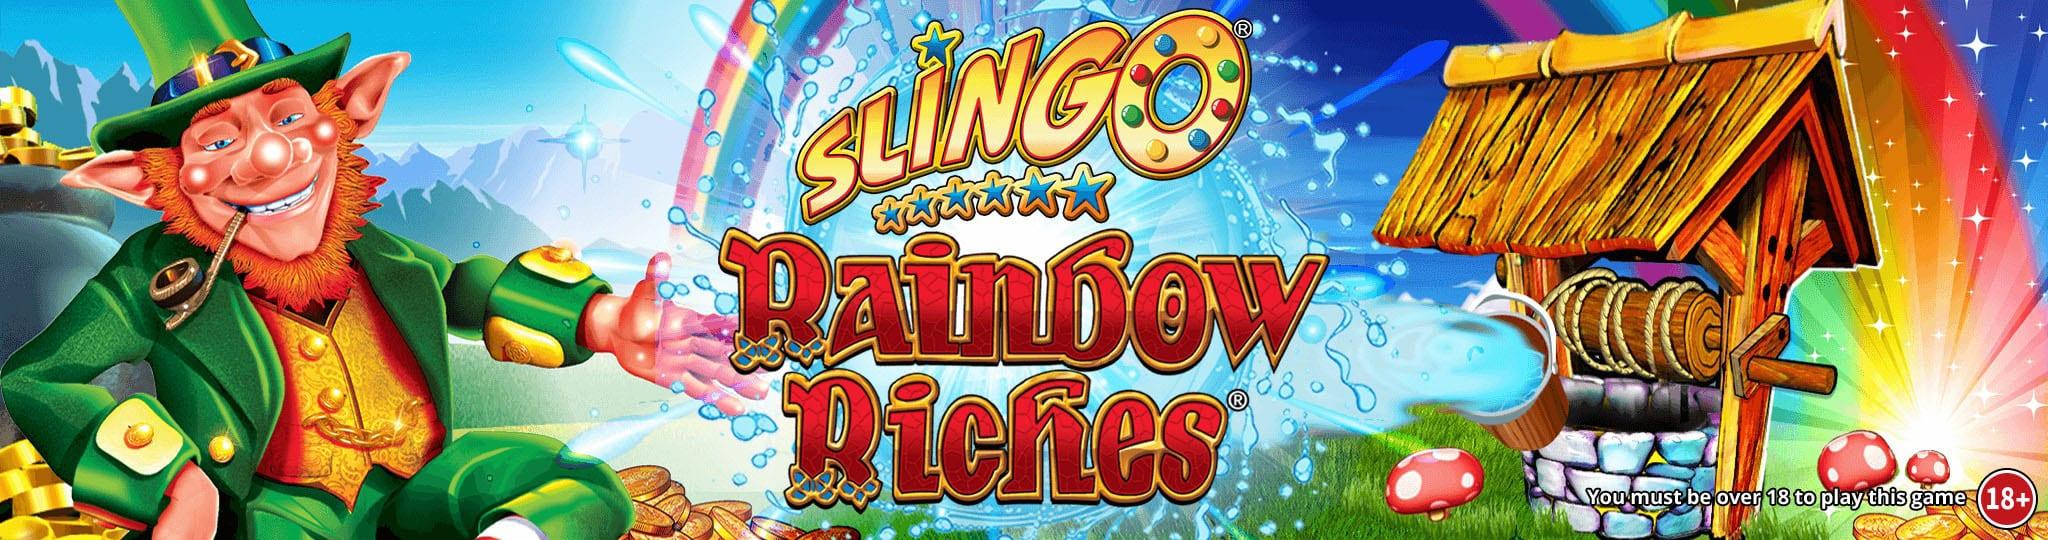 Slingo Rainbow Riches Wizard Slots